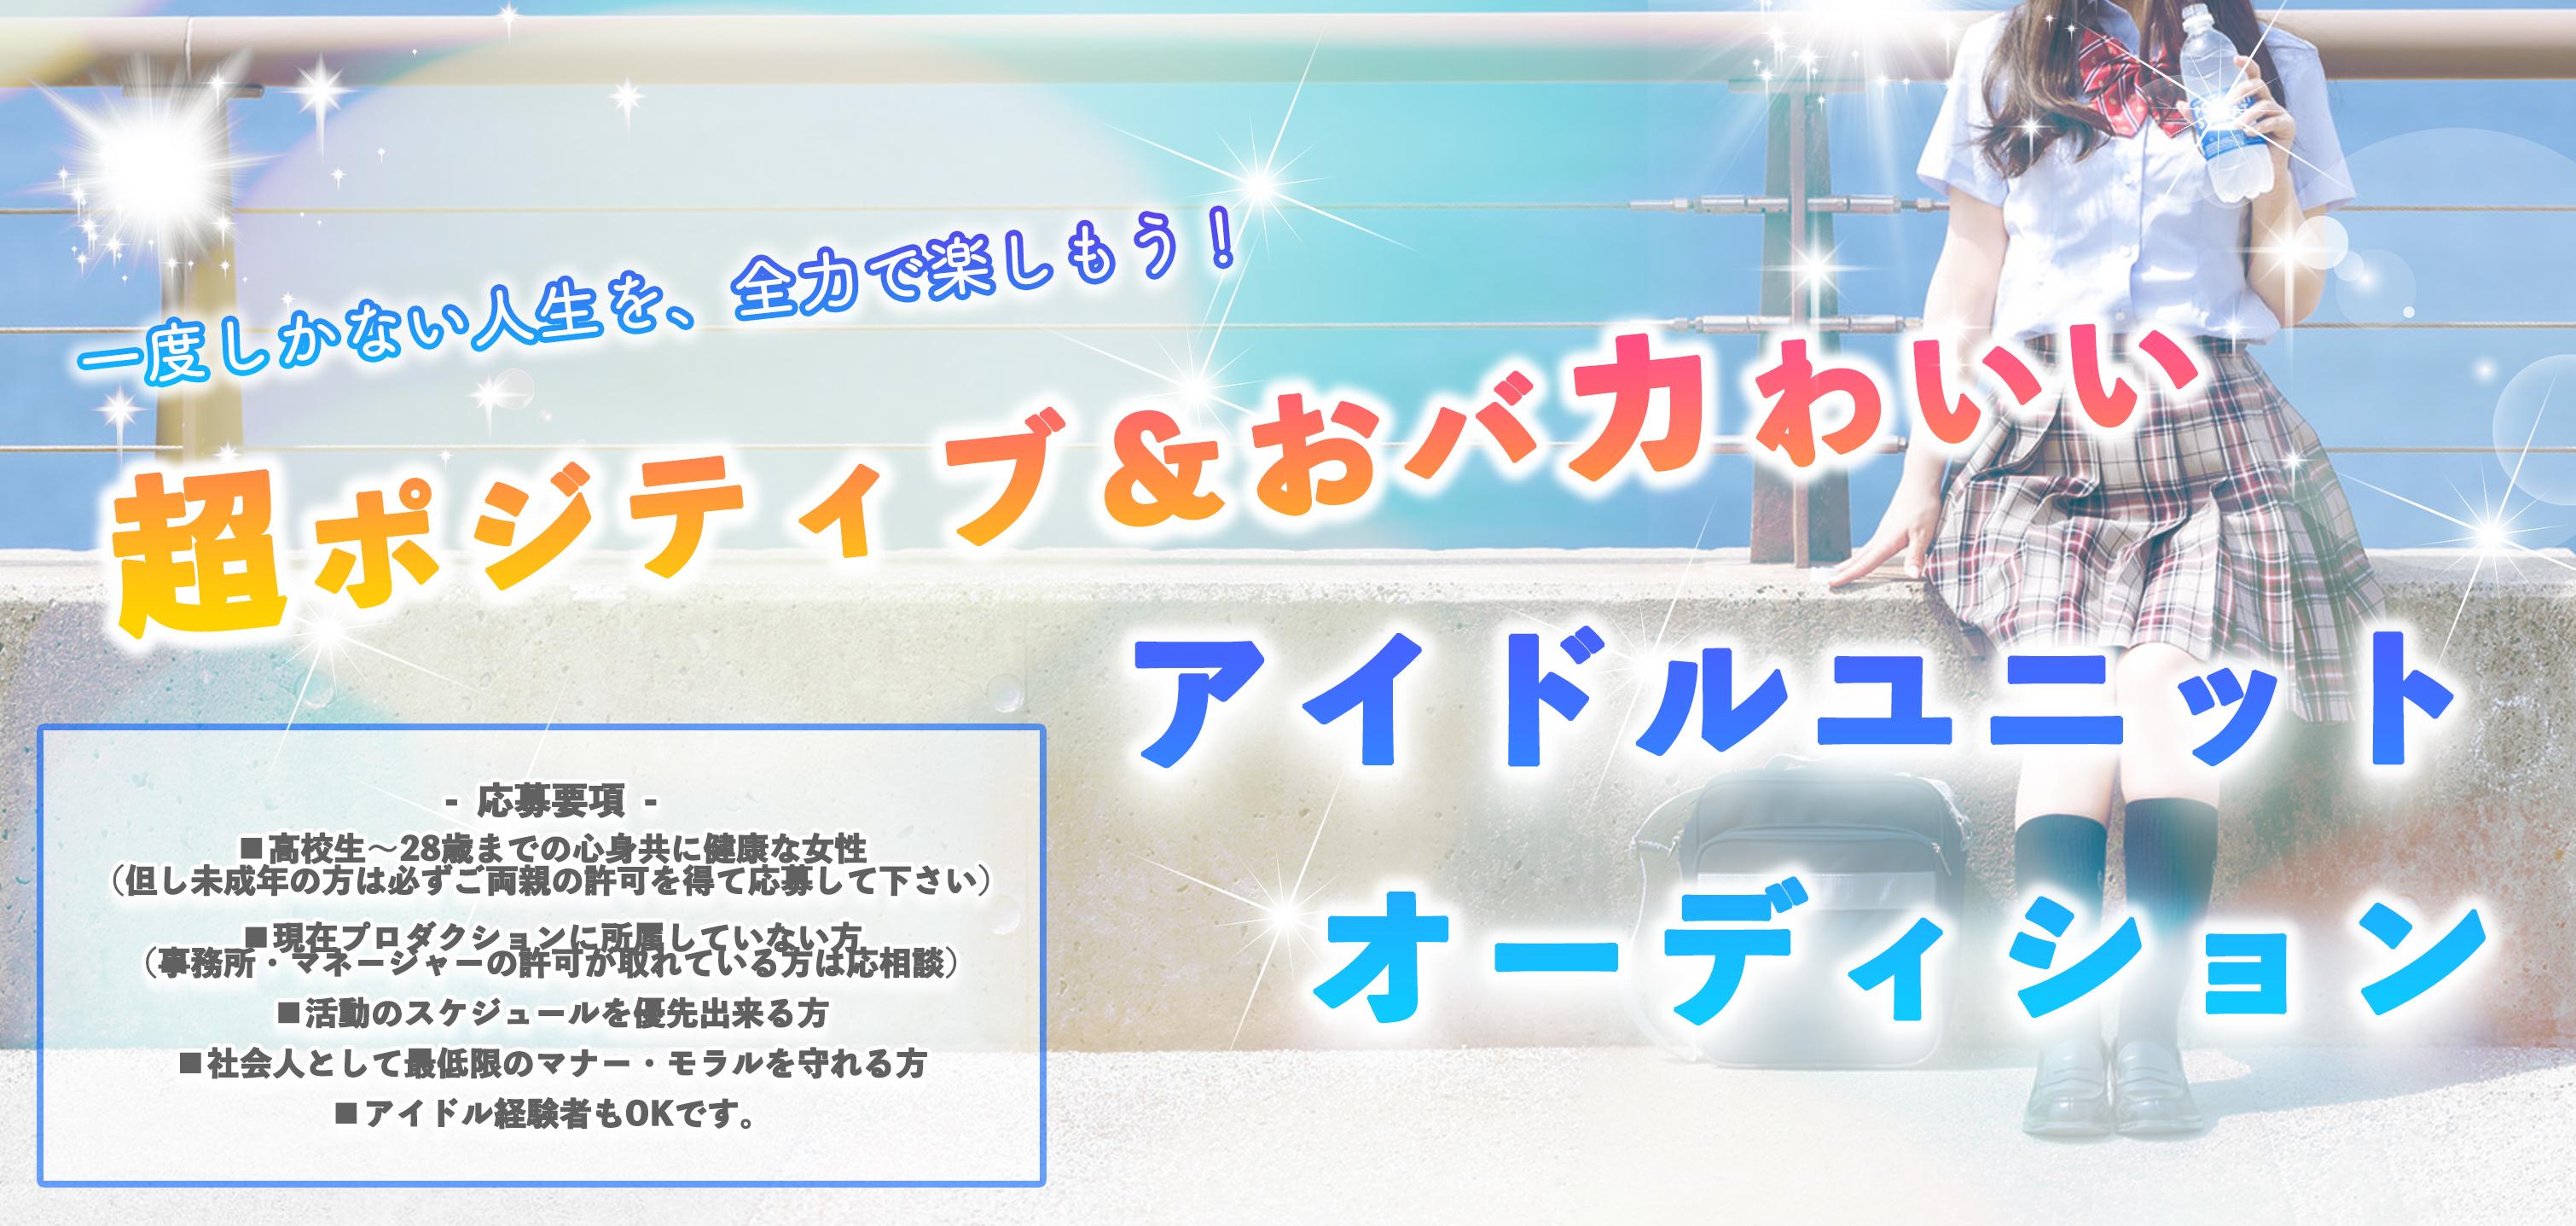 Answer Inc.「おバカわいい」新ユニット・既存ユニット合同オーディション!